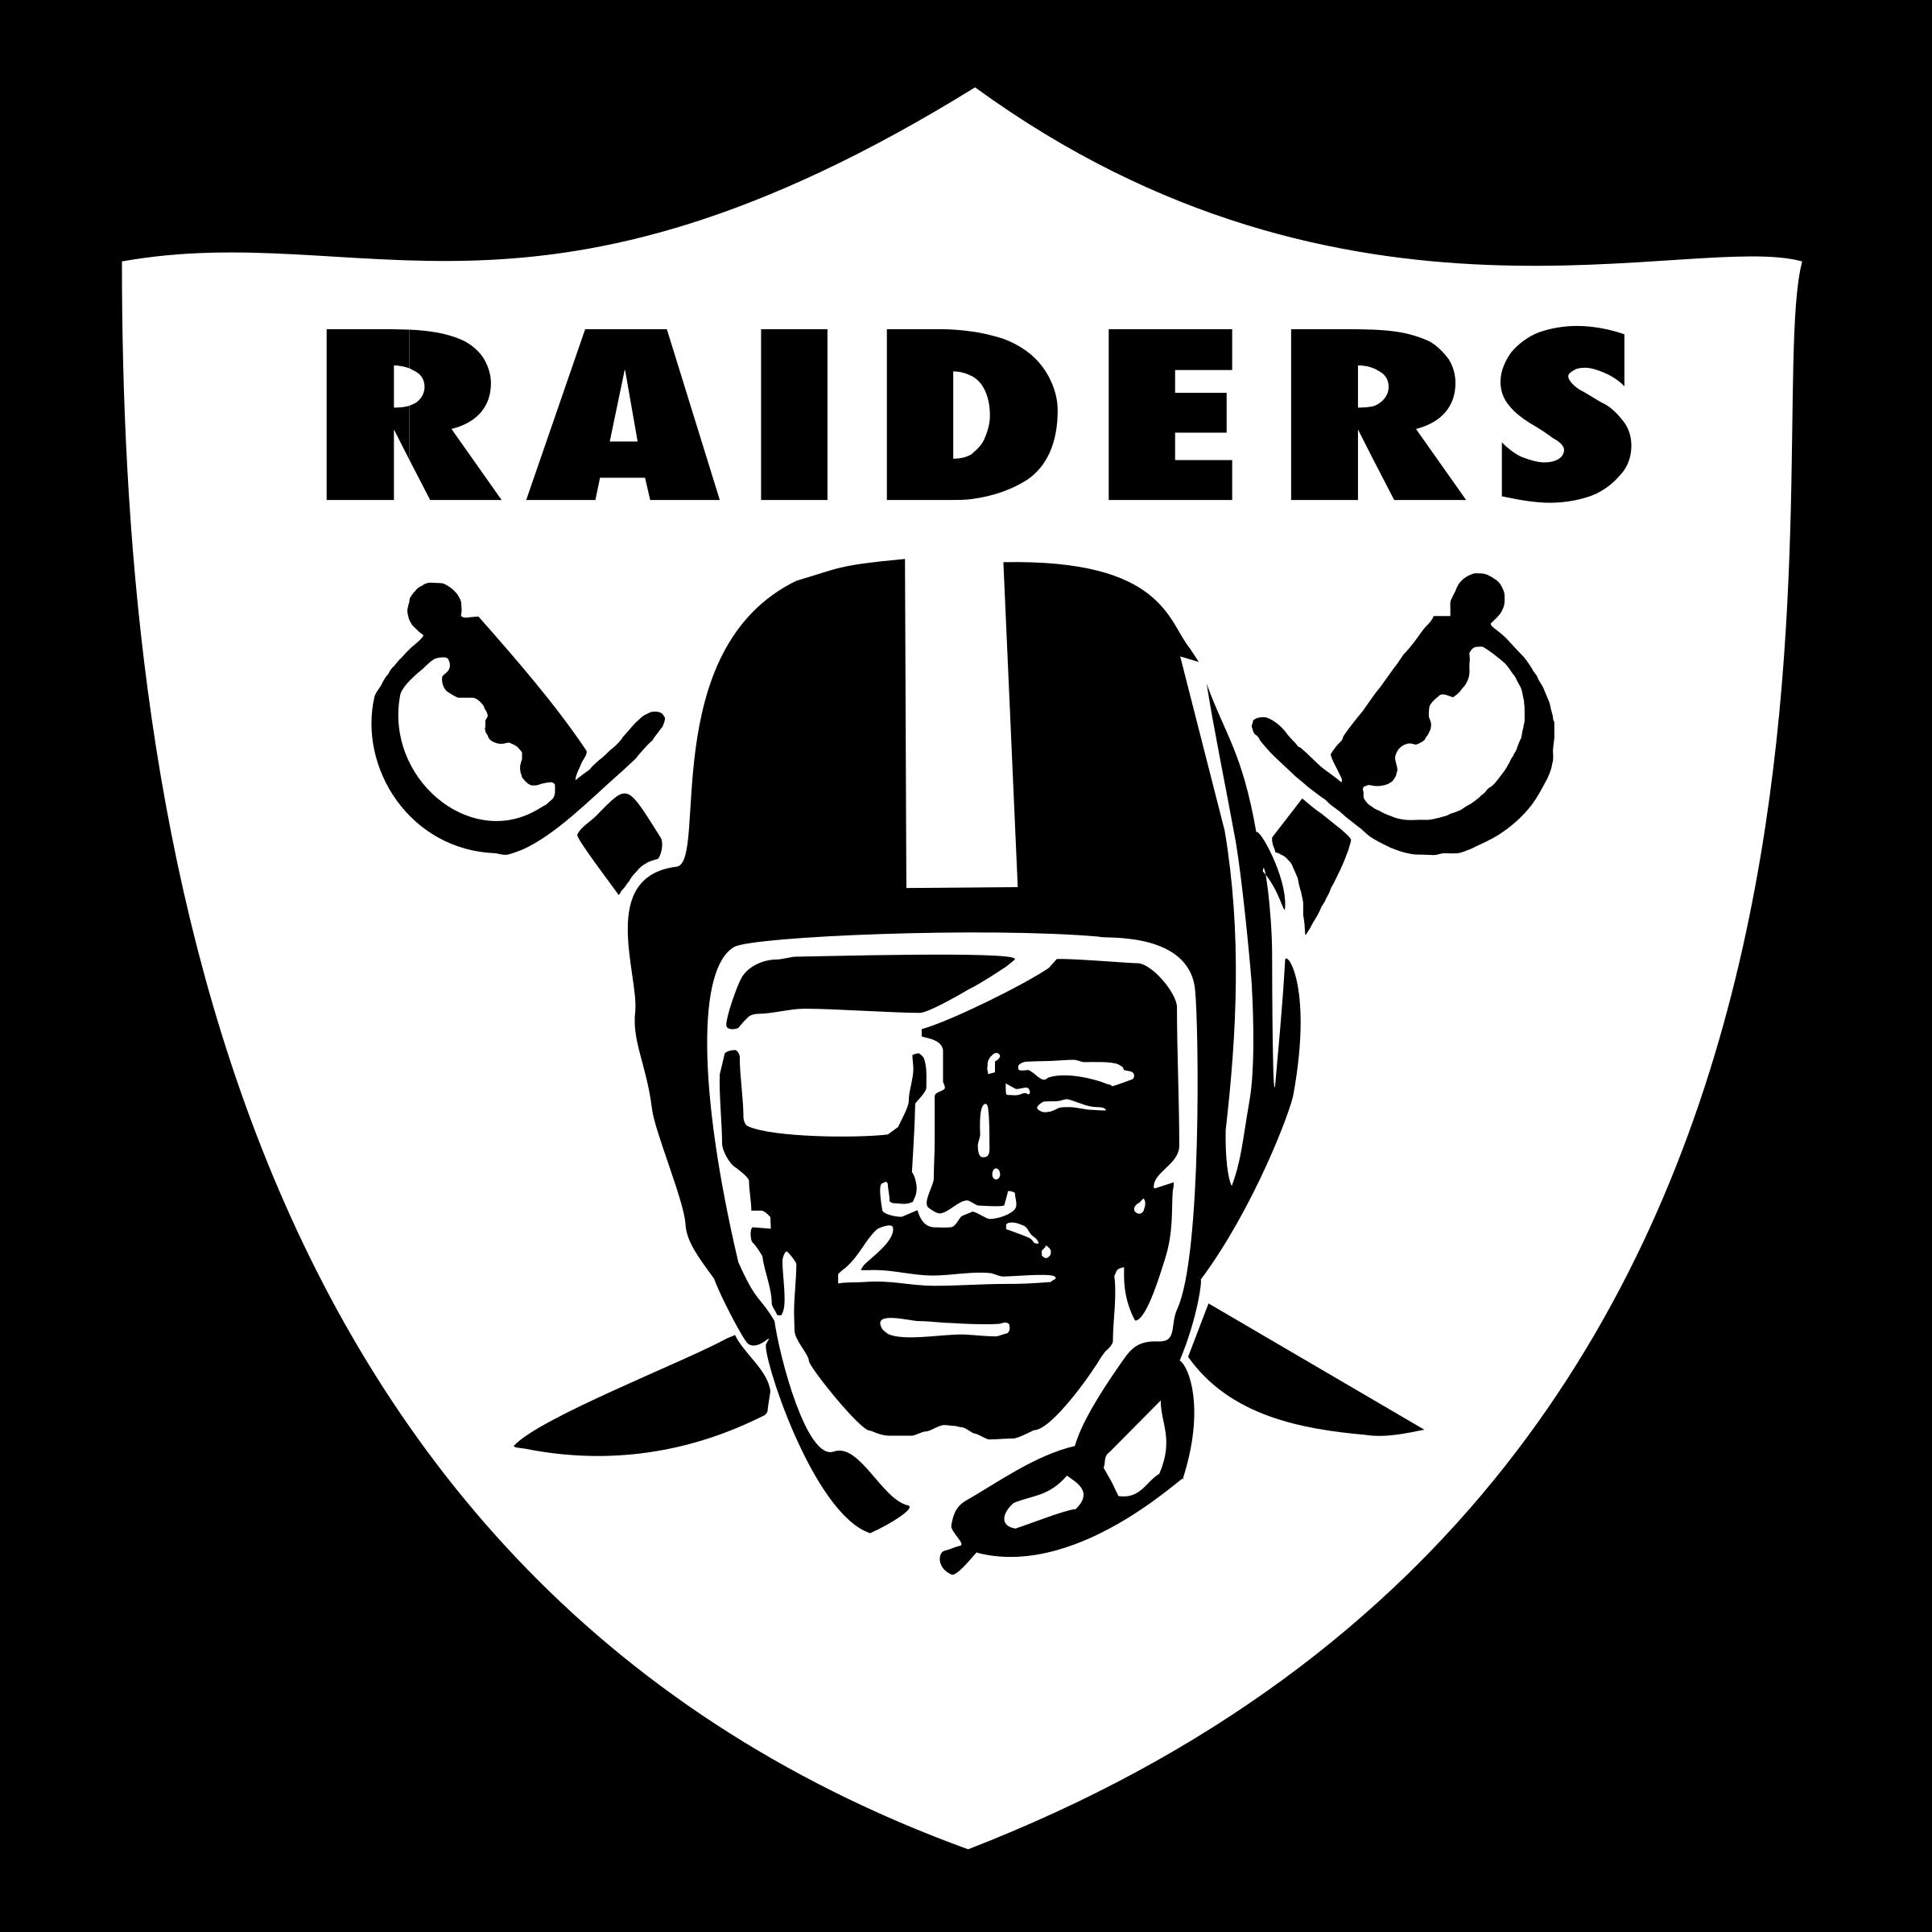 Raiders Logo Transparent Amp Svg Vector Freebie Supply